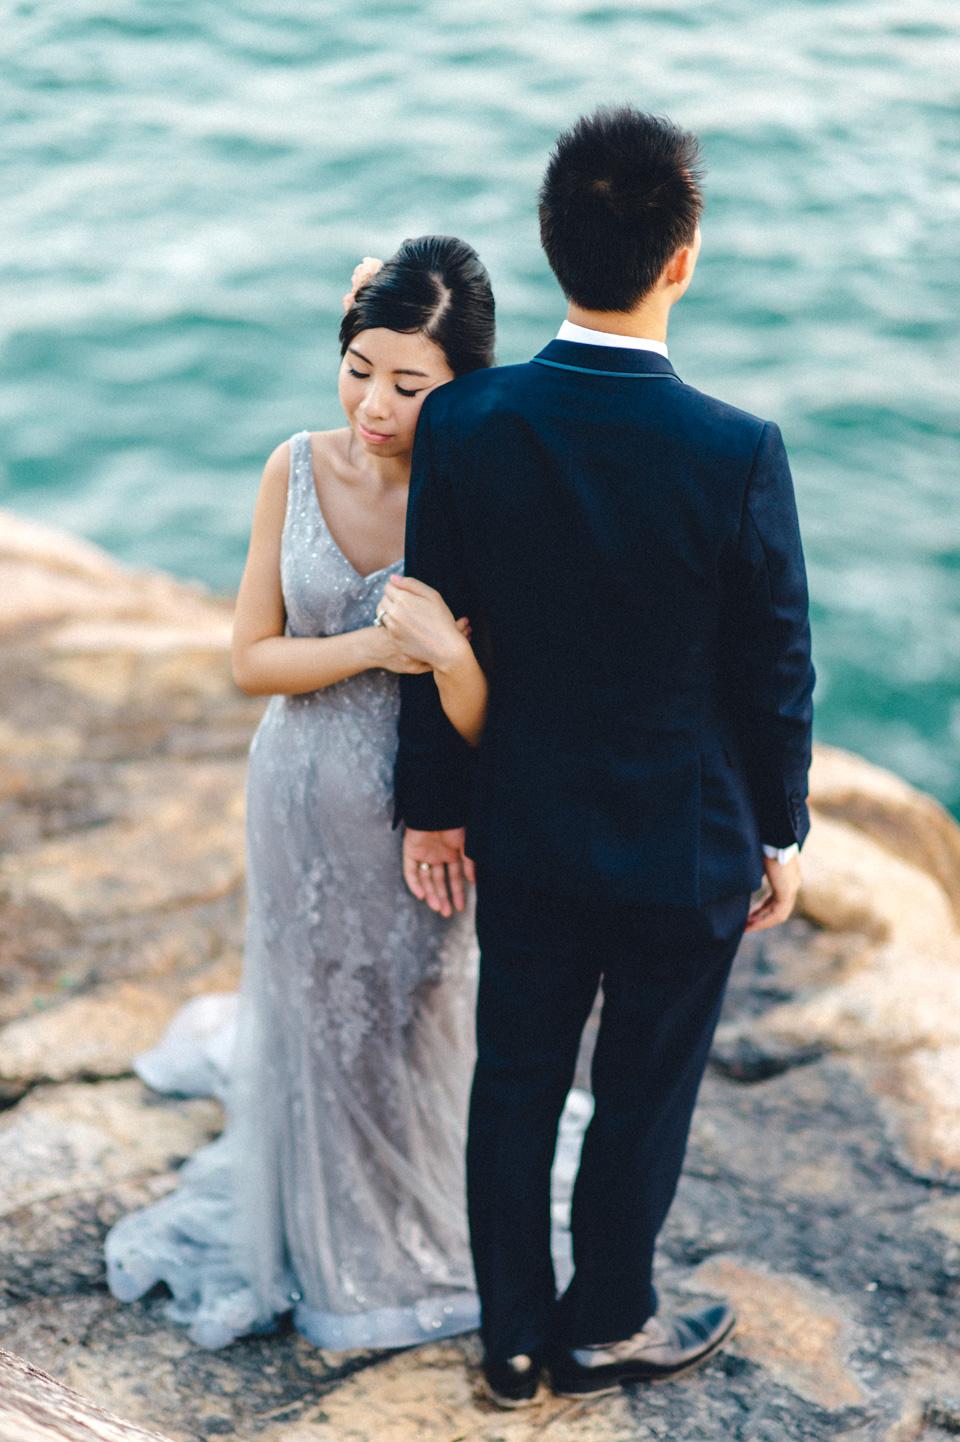 shooting-hongkong-beach-35 After Weddingshoot in HongKongshooting hongkong beach 35